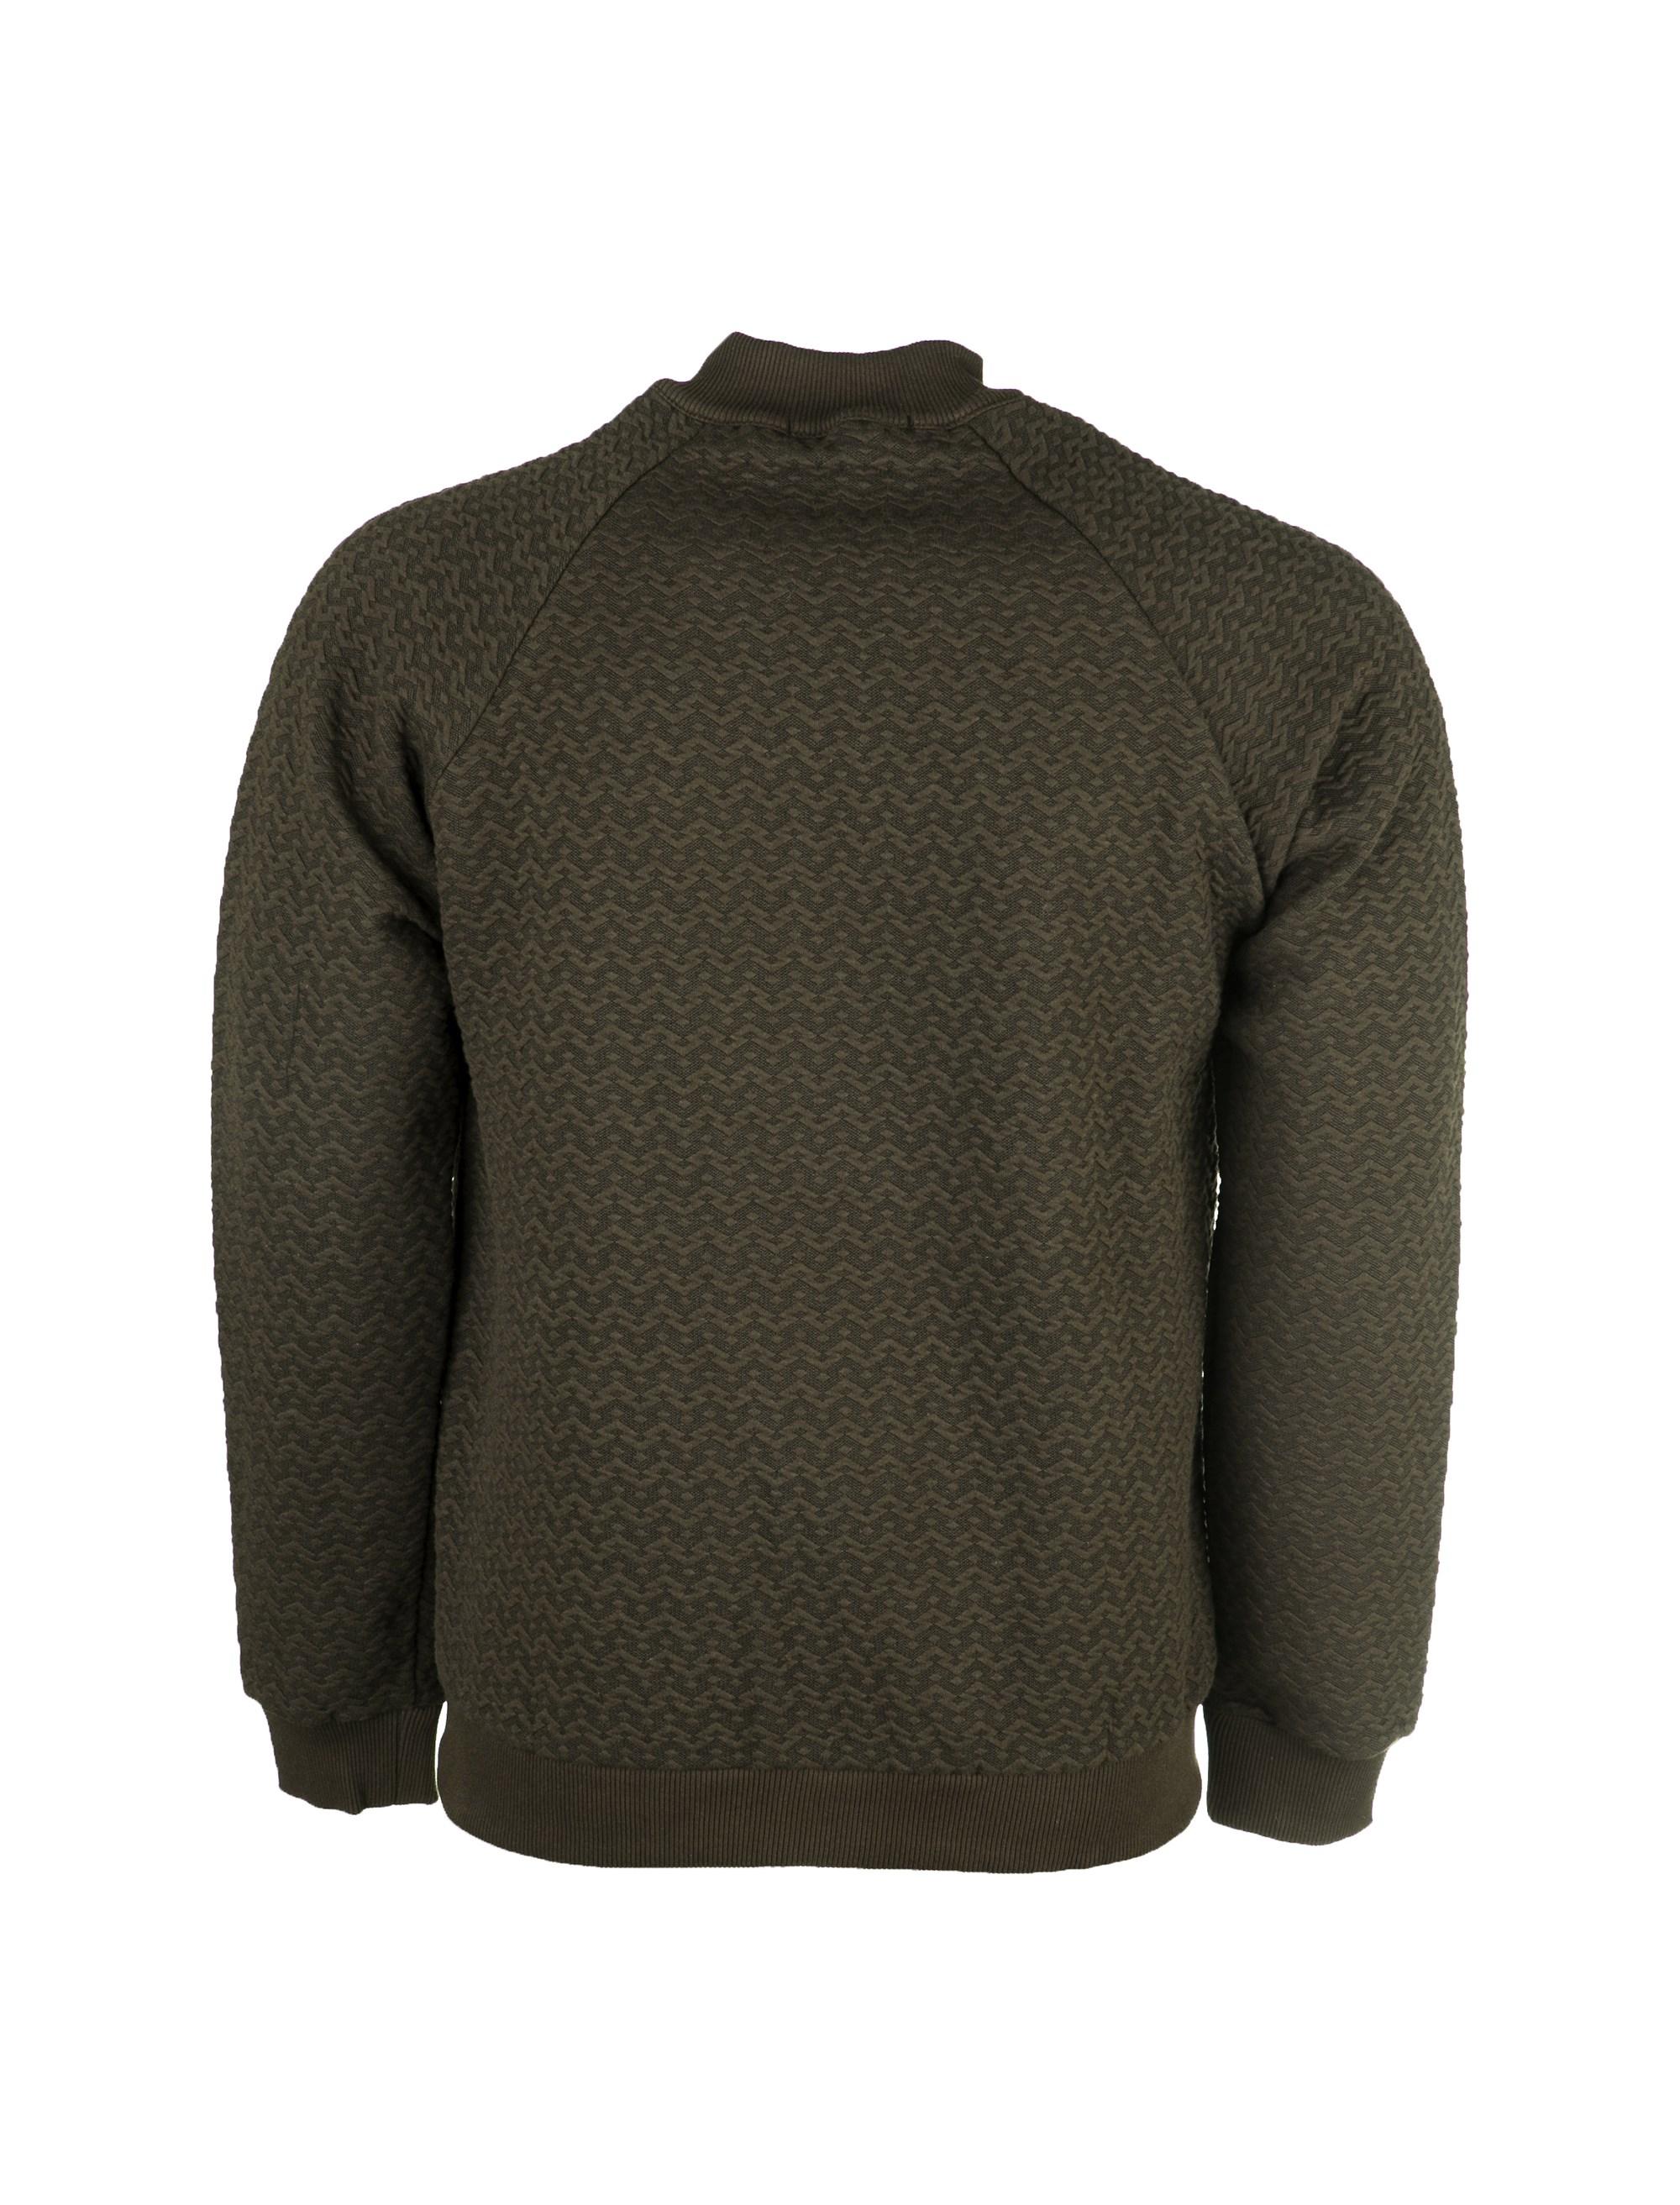 سویشرت نخی زیپ دار مردانه - جامه پوش آرا